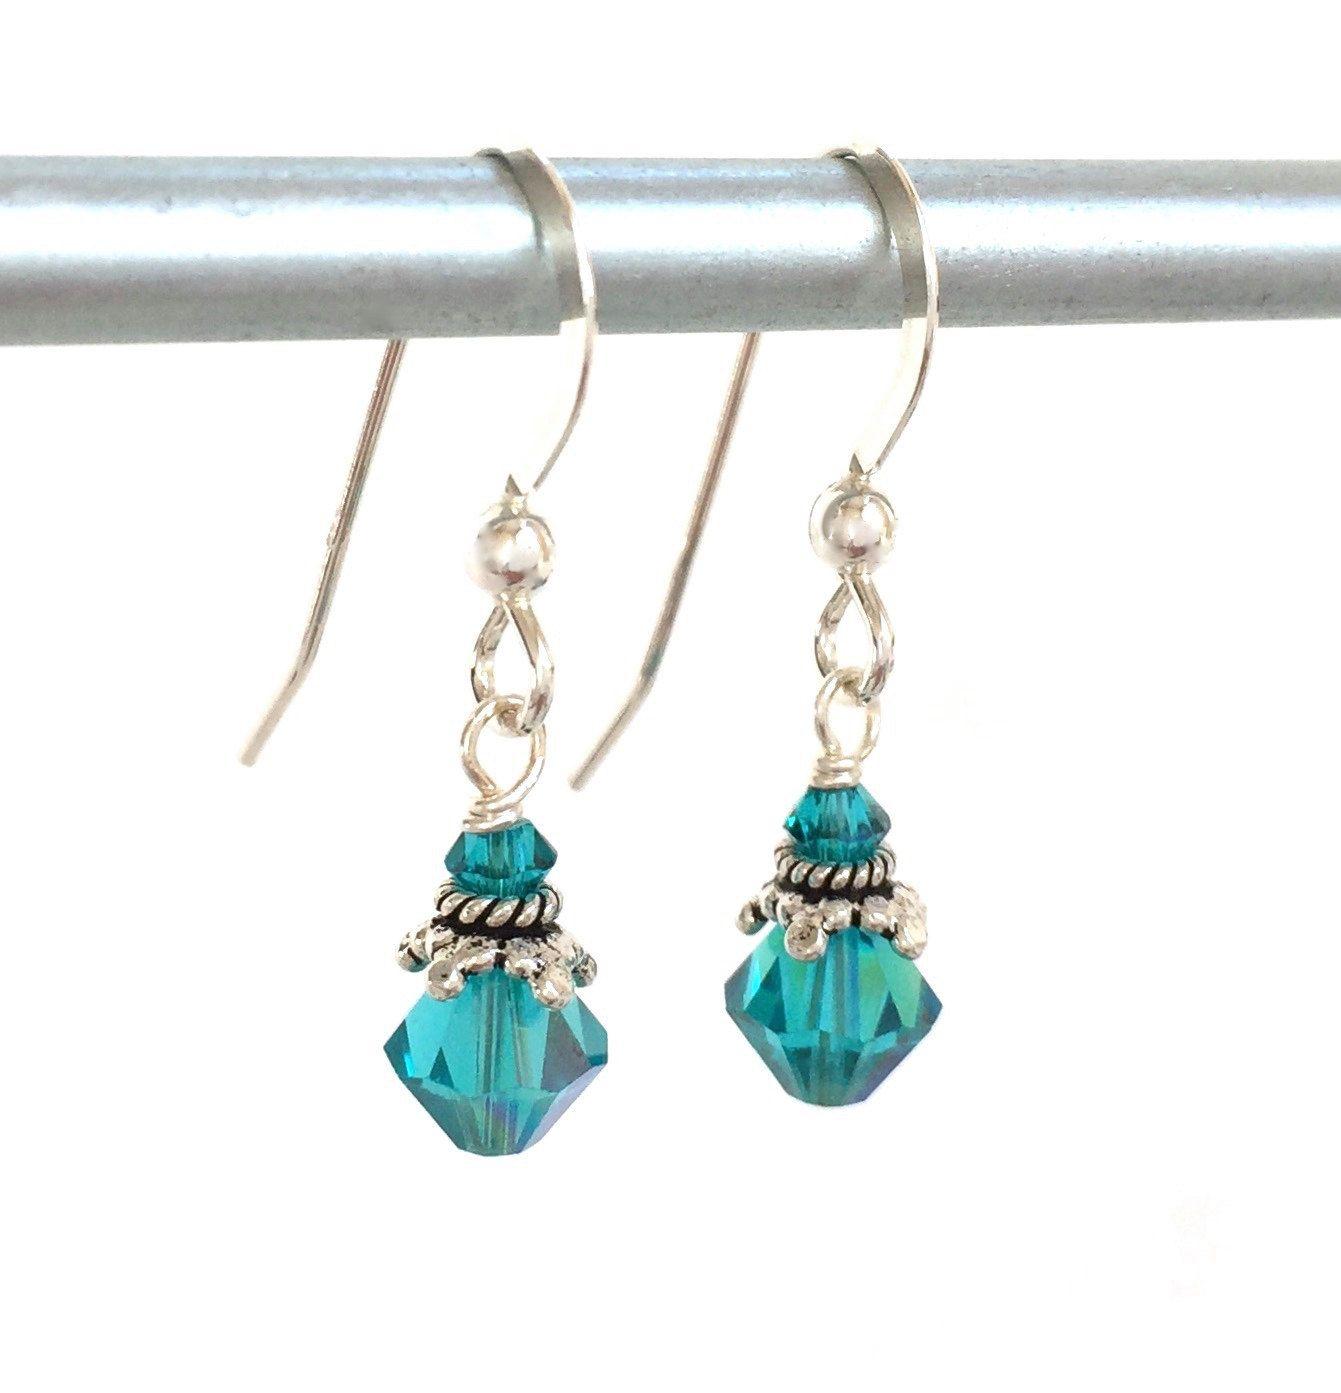 Swarovski Crystals  Teal Blue Earrings  Tiny Crystal Earring  Bridesmaid  Jewelry  Birthday Gift